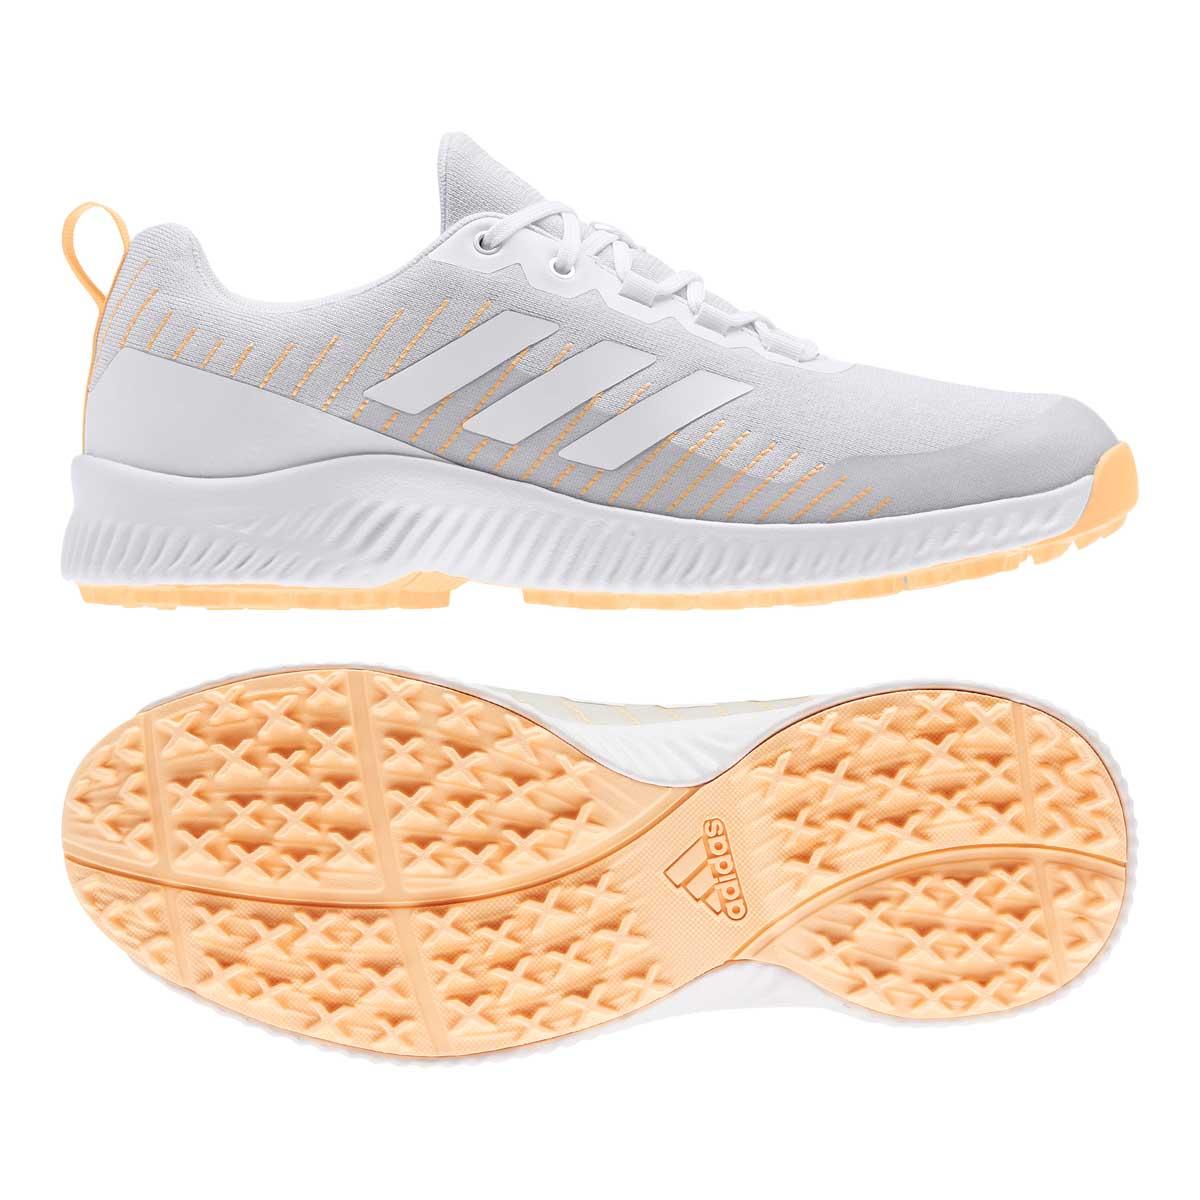 Adidas Women's Response Bounce Spikeless Grey/White Golf Shoe